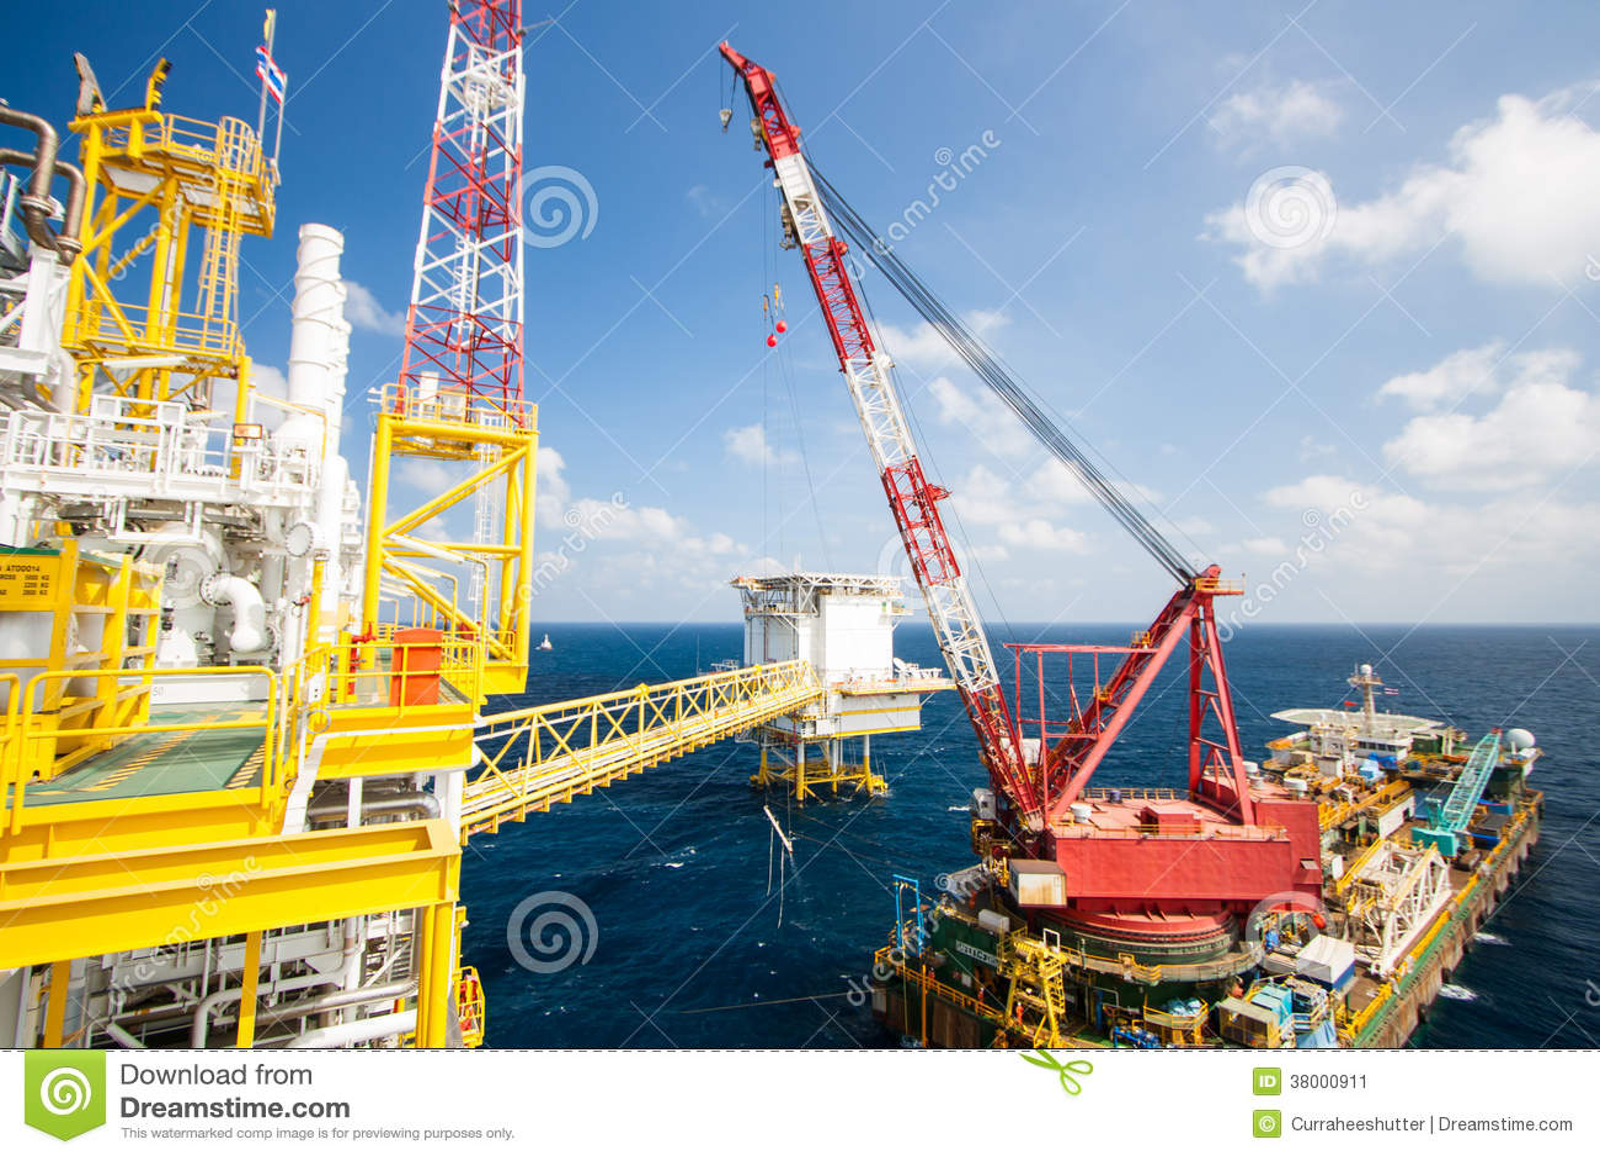 Offshore Marine Photos : Large crane vessel installing the platform in offshore